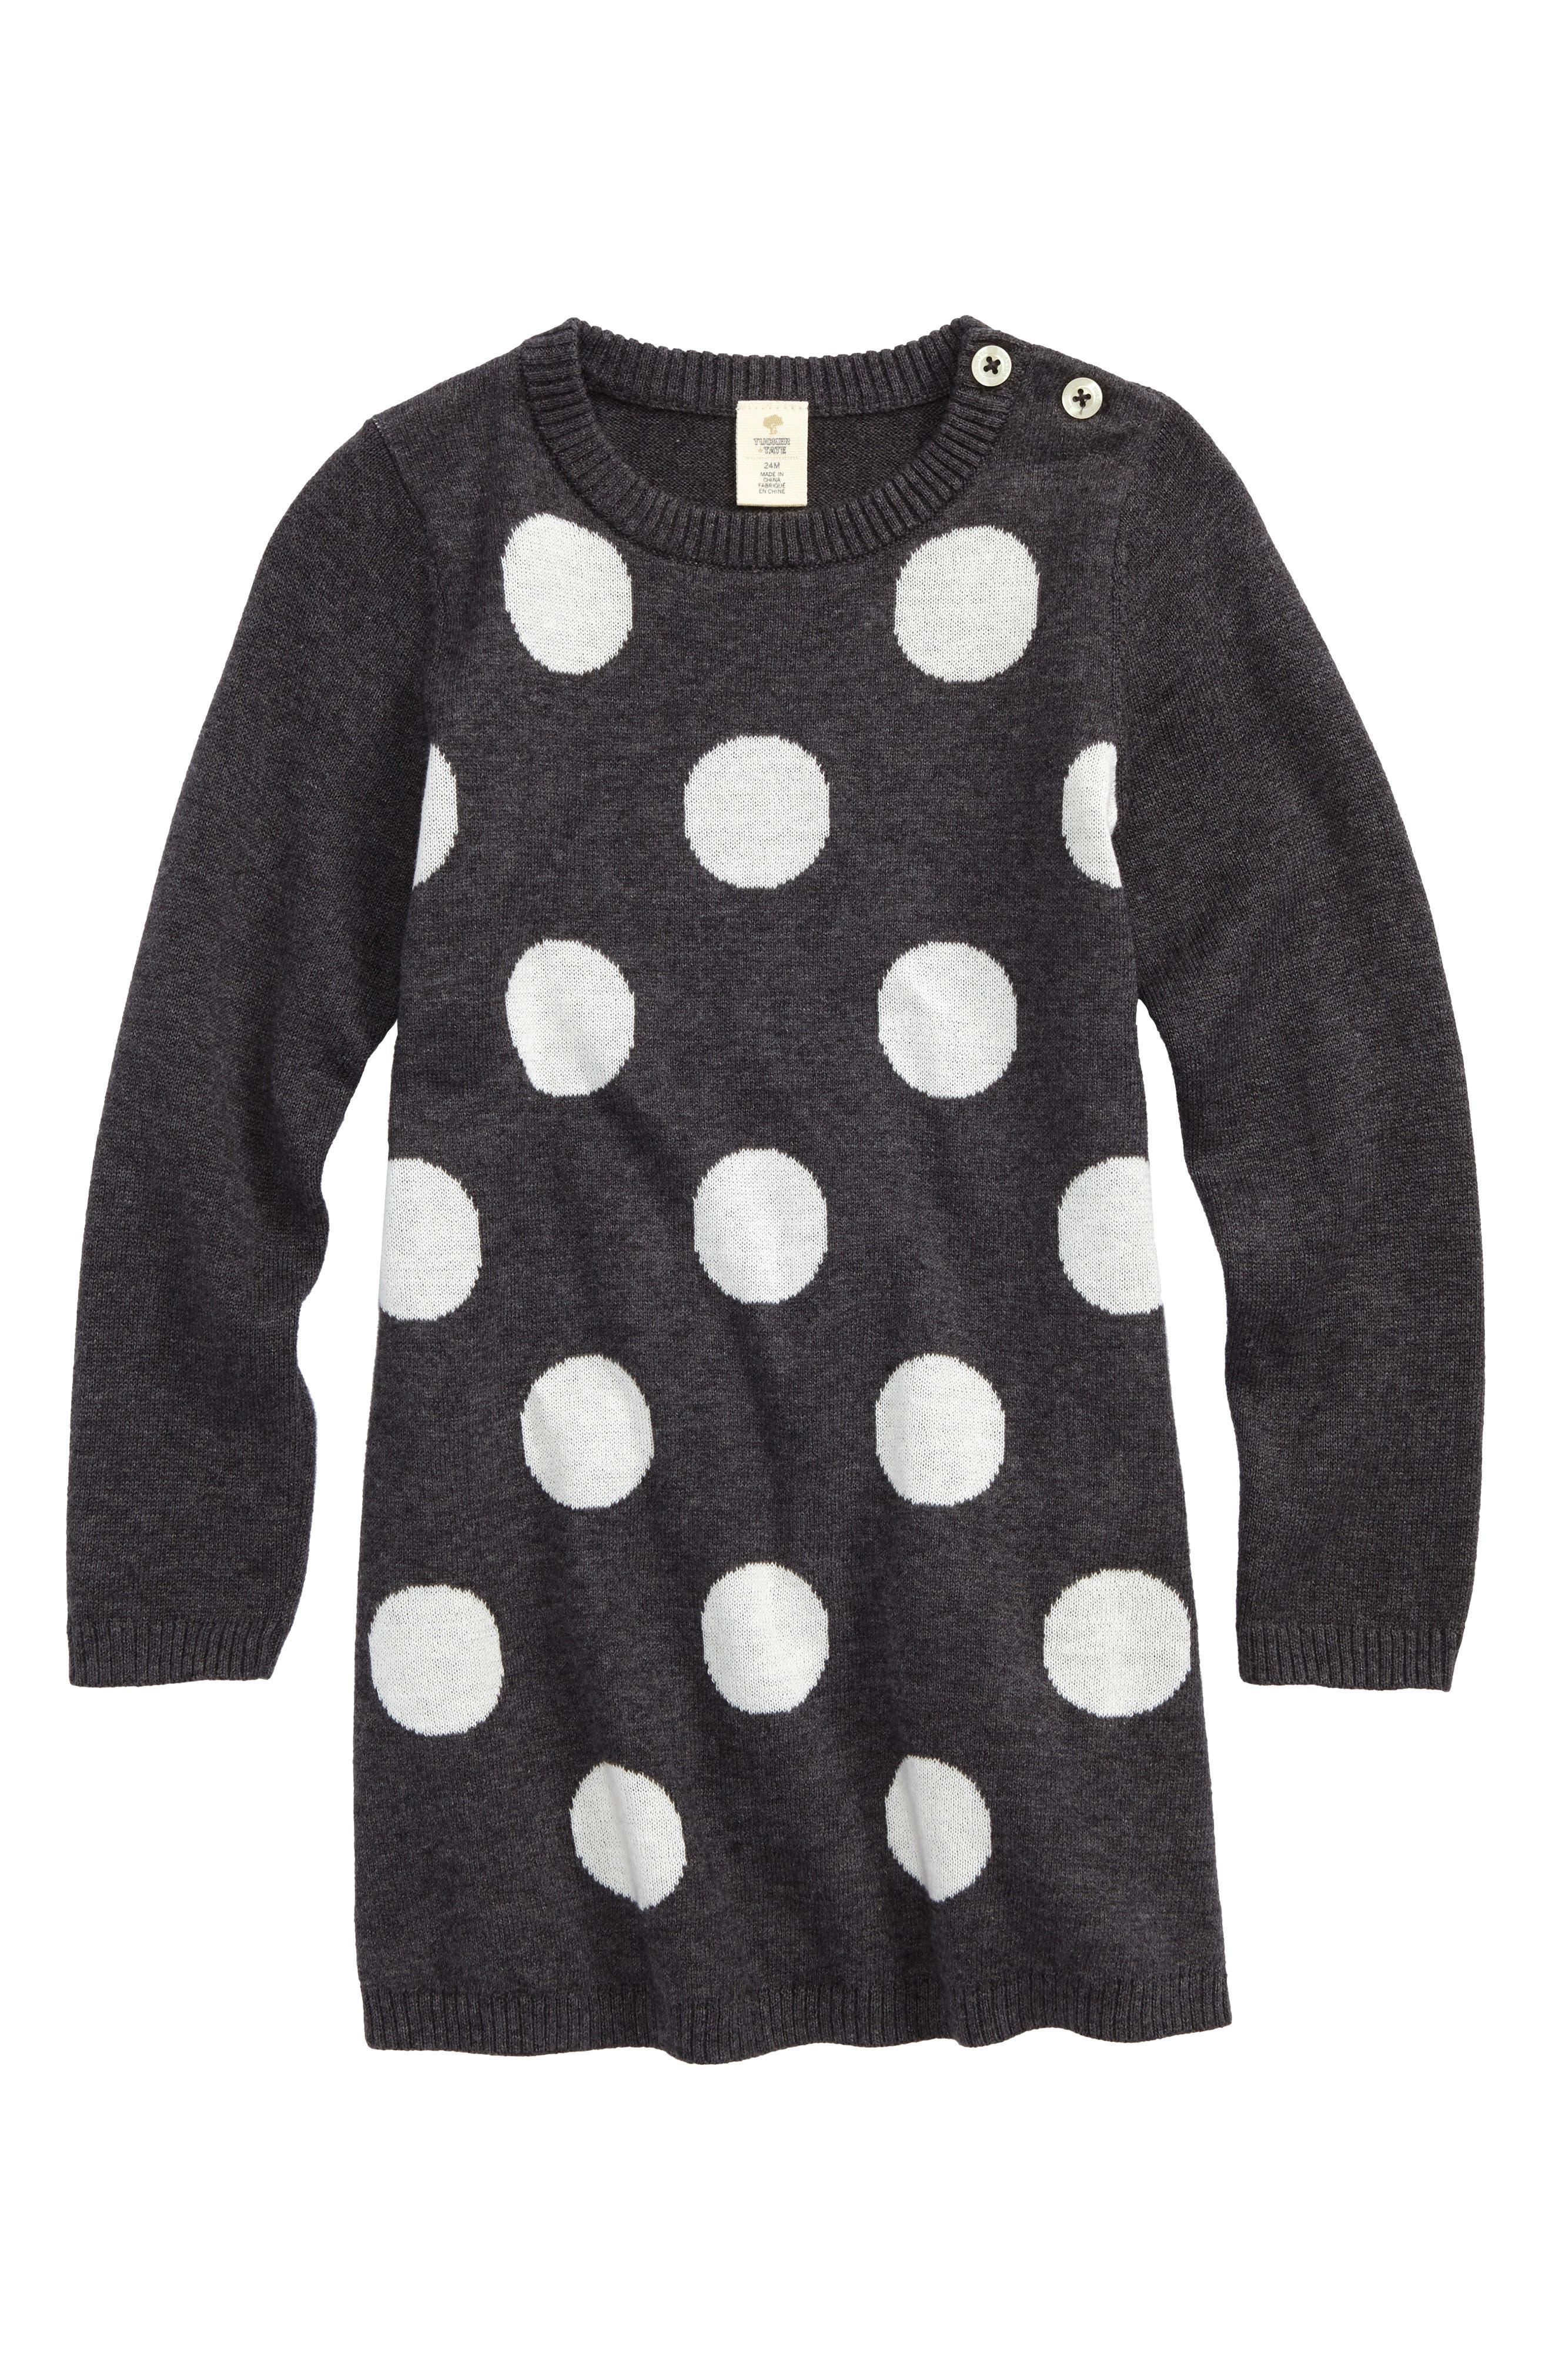 Tucker + Tate Polka Dot Sweater Dress (Baby Girls)